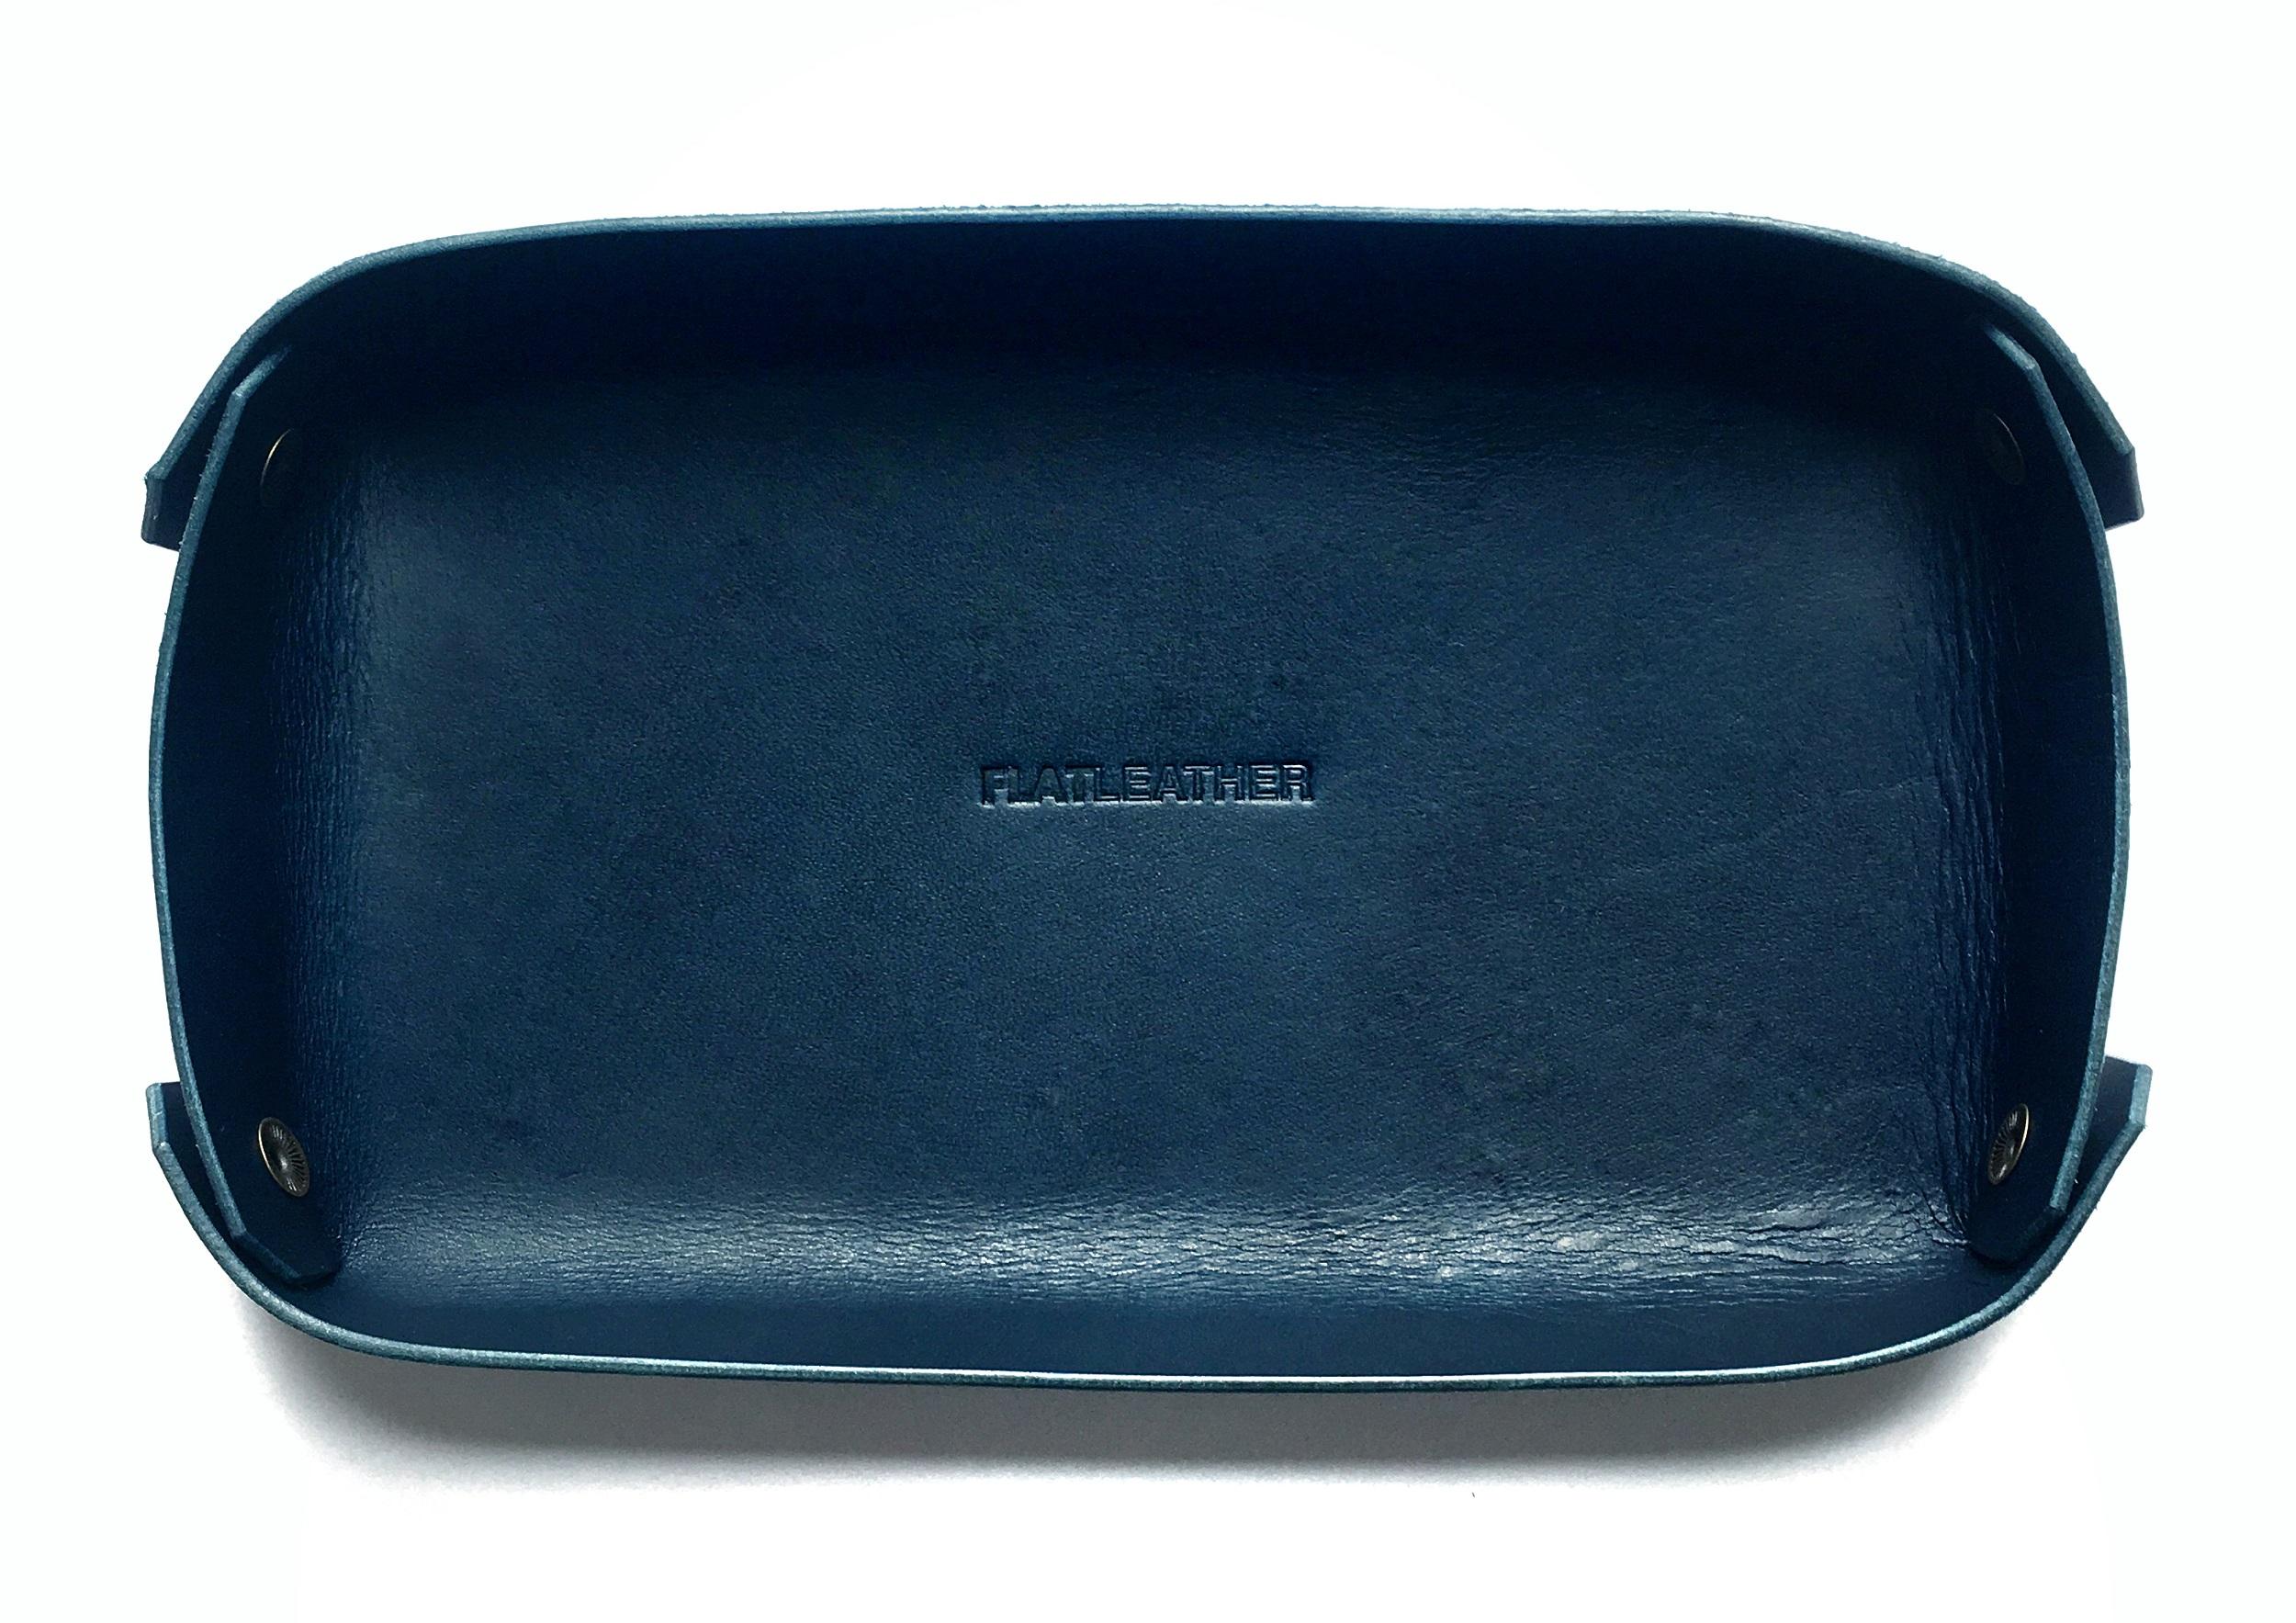 flat-tray-blue-1.jpg